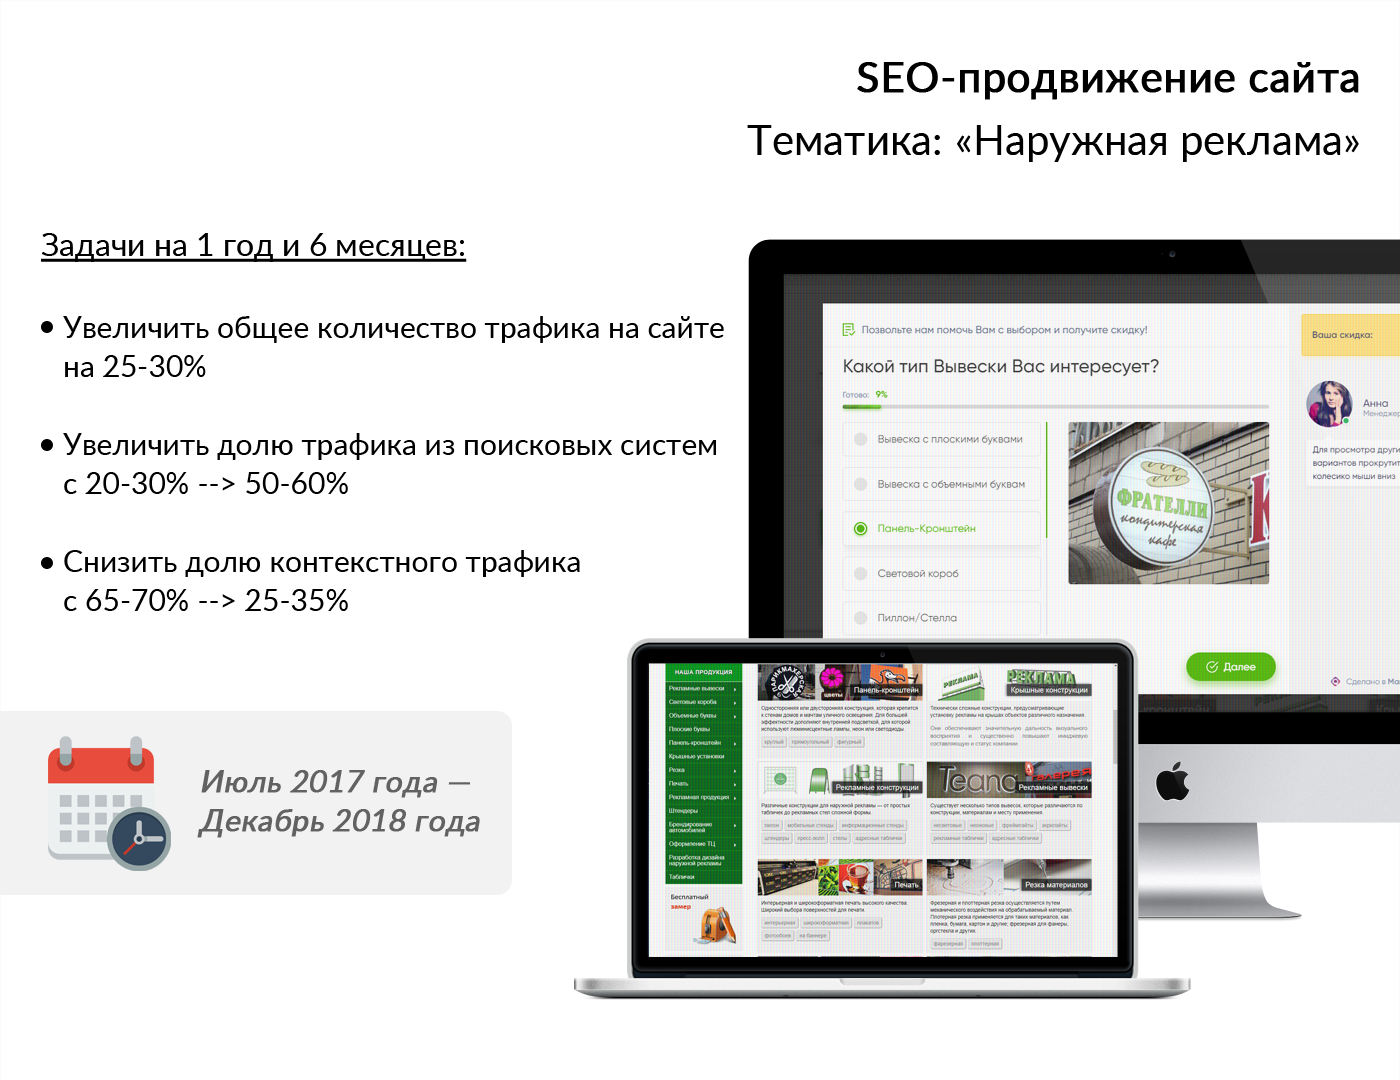 Кейс: «SEO-трафик X2 на сайте рекламно-производственной компании»